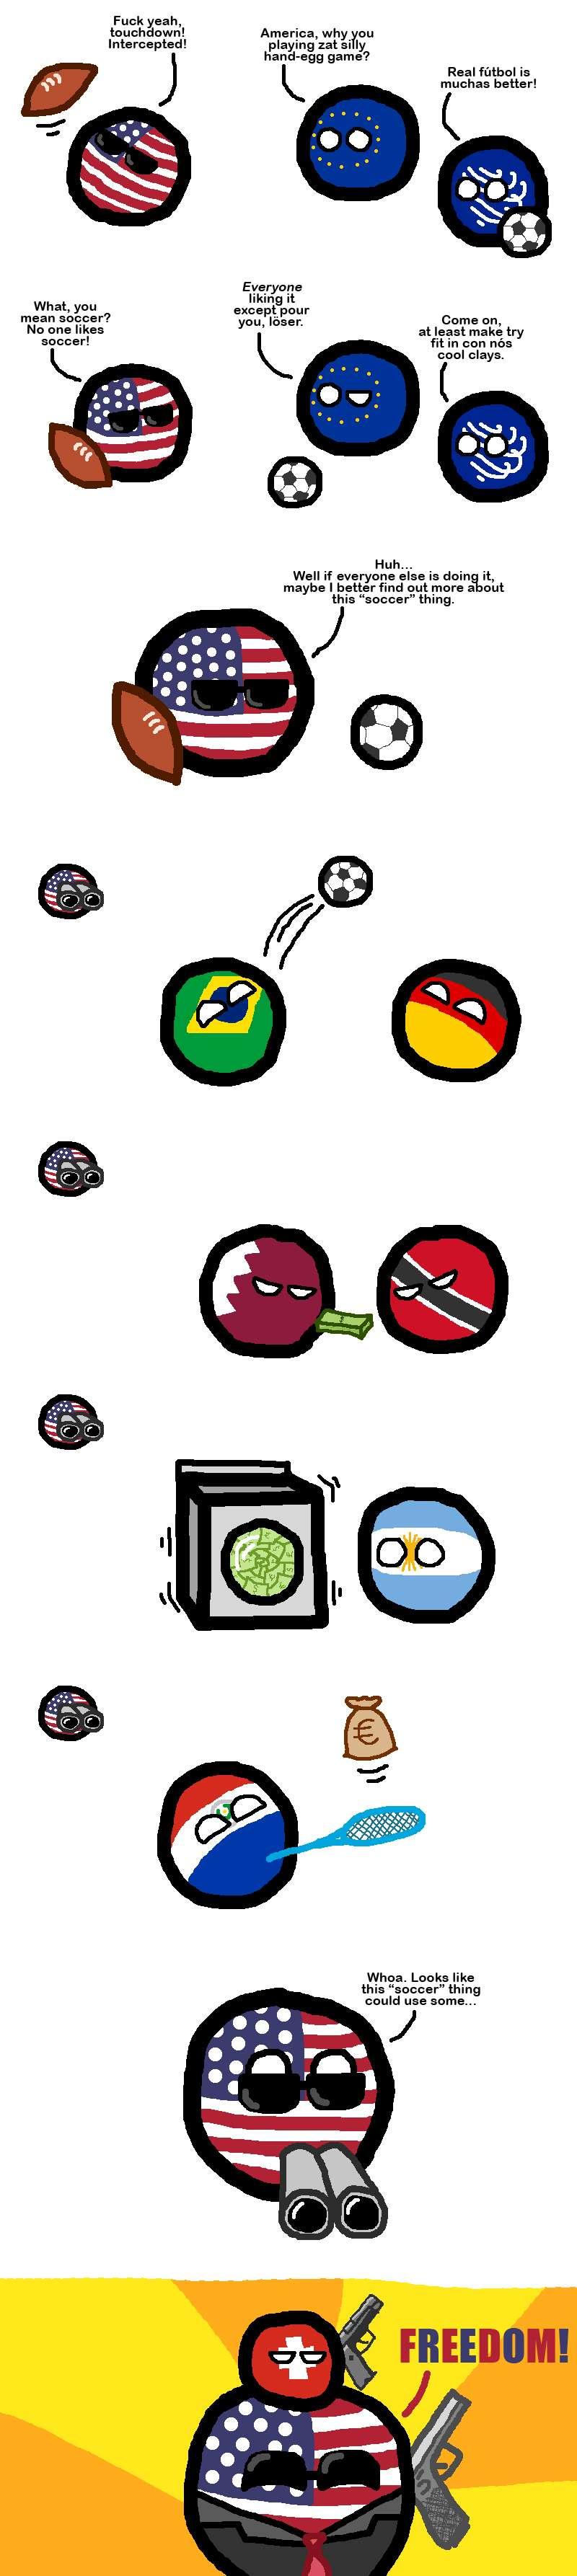 Polandball Comics - Page 3 Lmlrn510